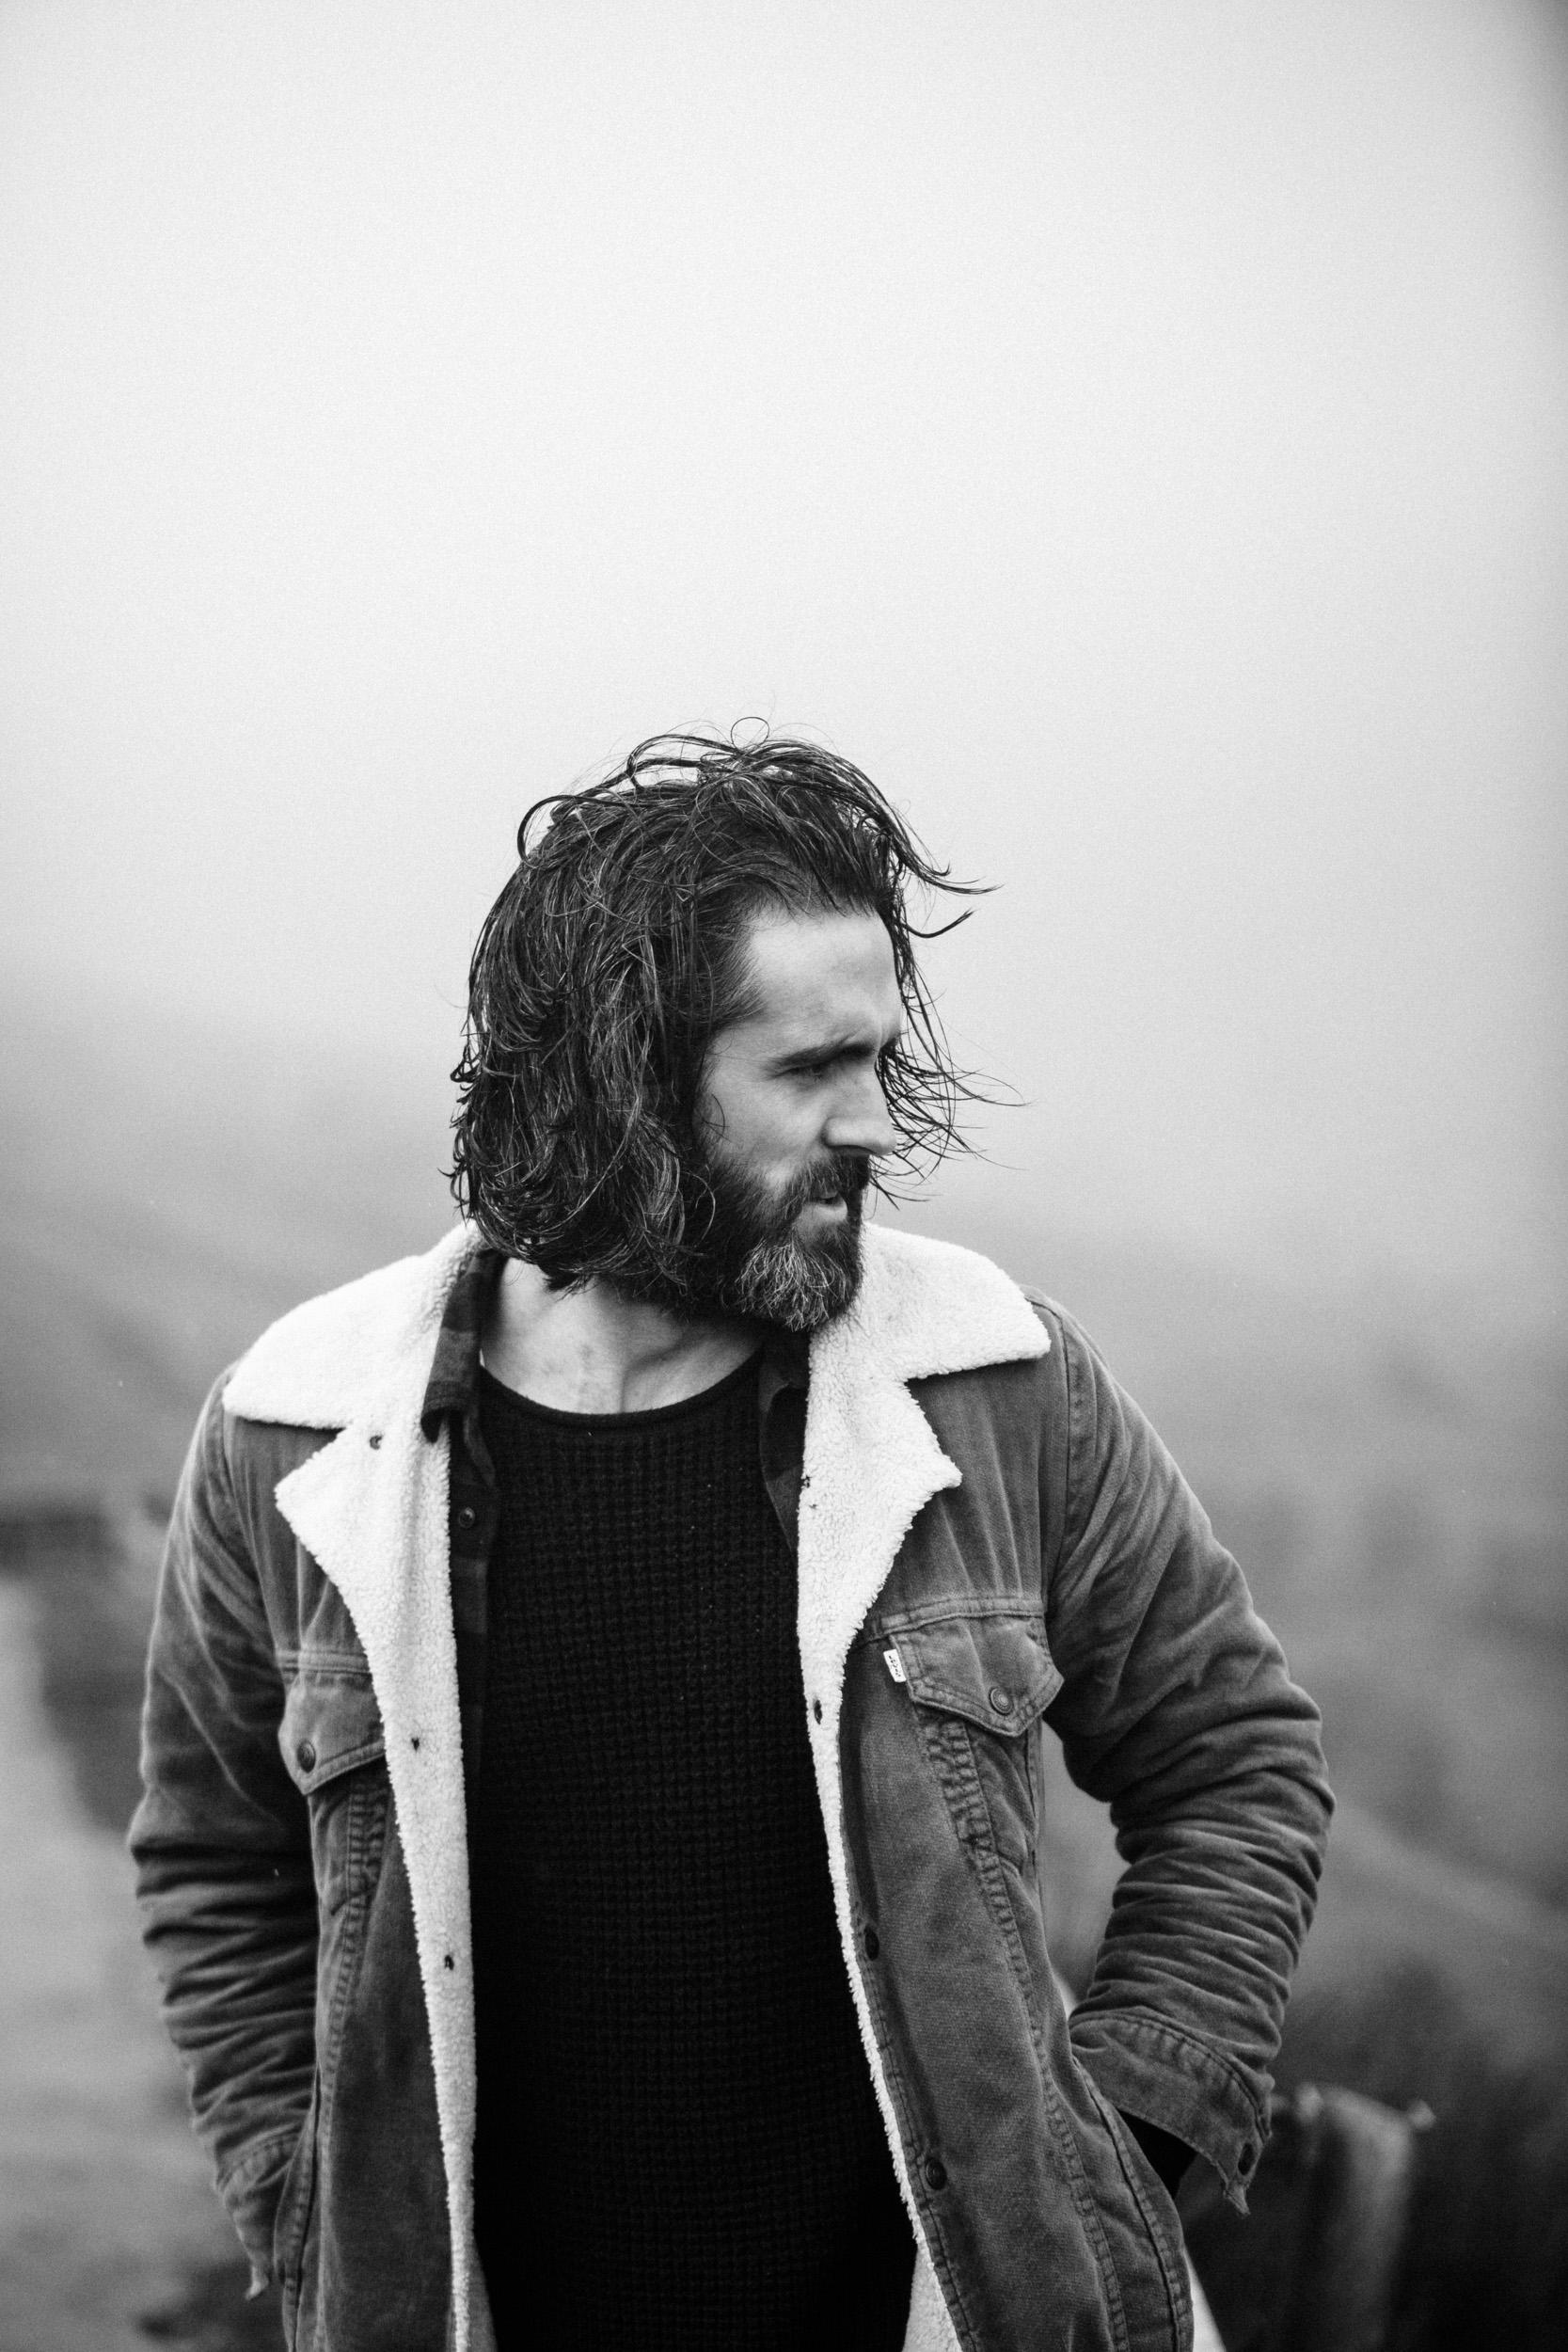 Cardiff Photographer Alex Sedgmond - Photography South Wales - Model Photography Cardiff south wales-4.jpg